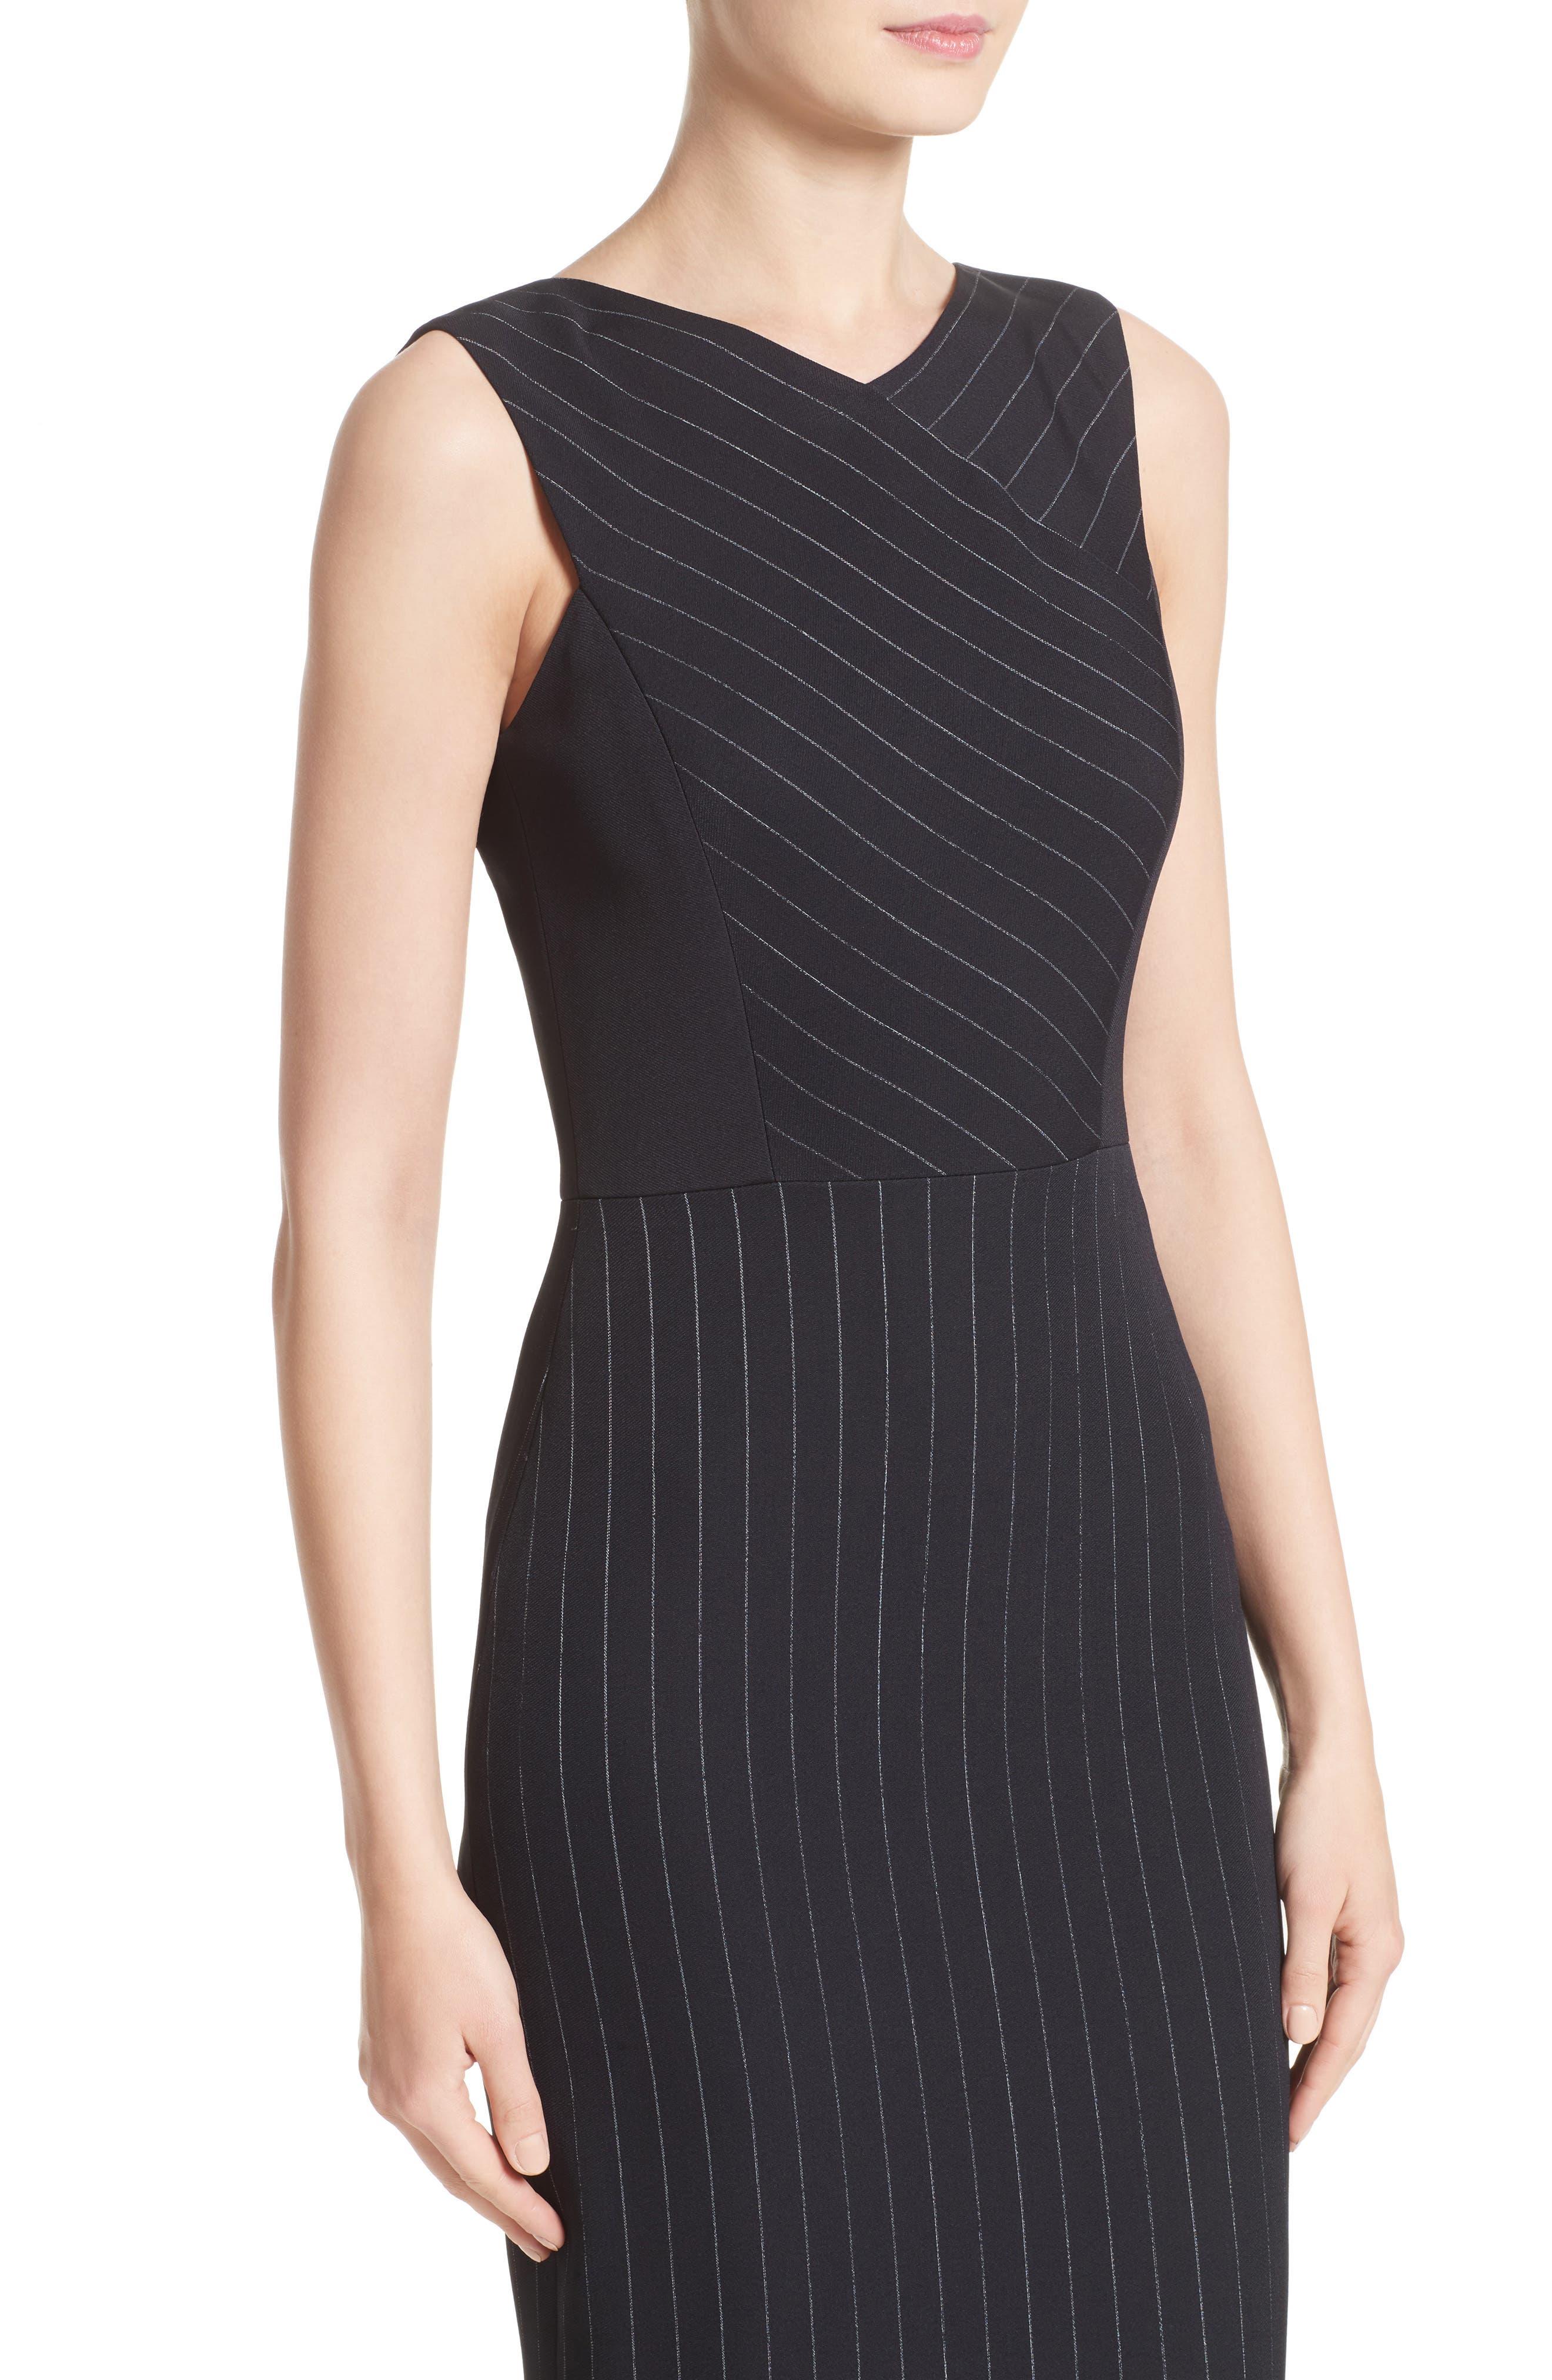 Pinstripe Stretch Dress,                             Alternate thumbnail 7, color,                             Black/ Chalk